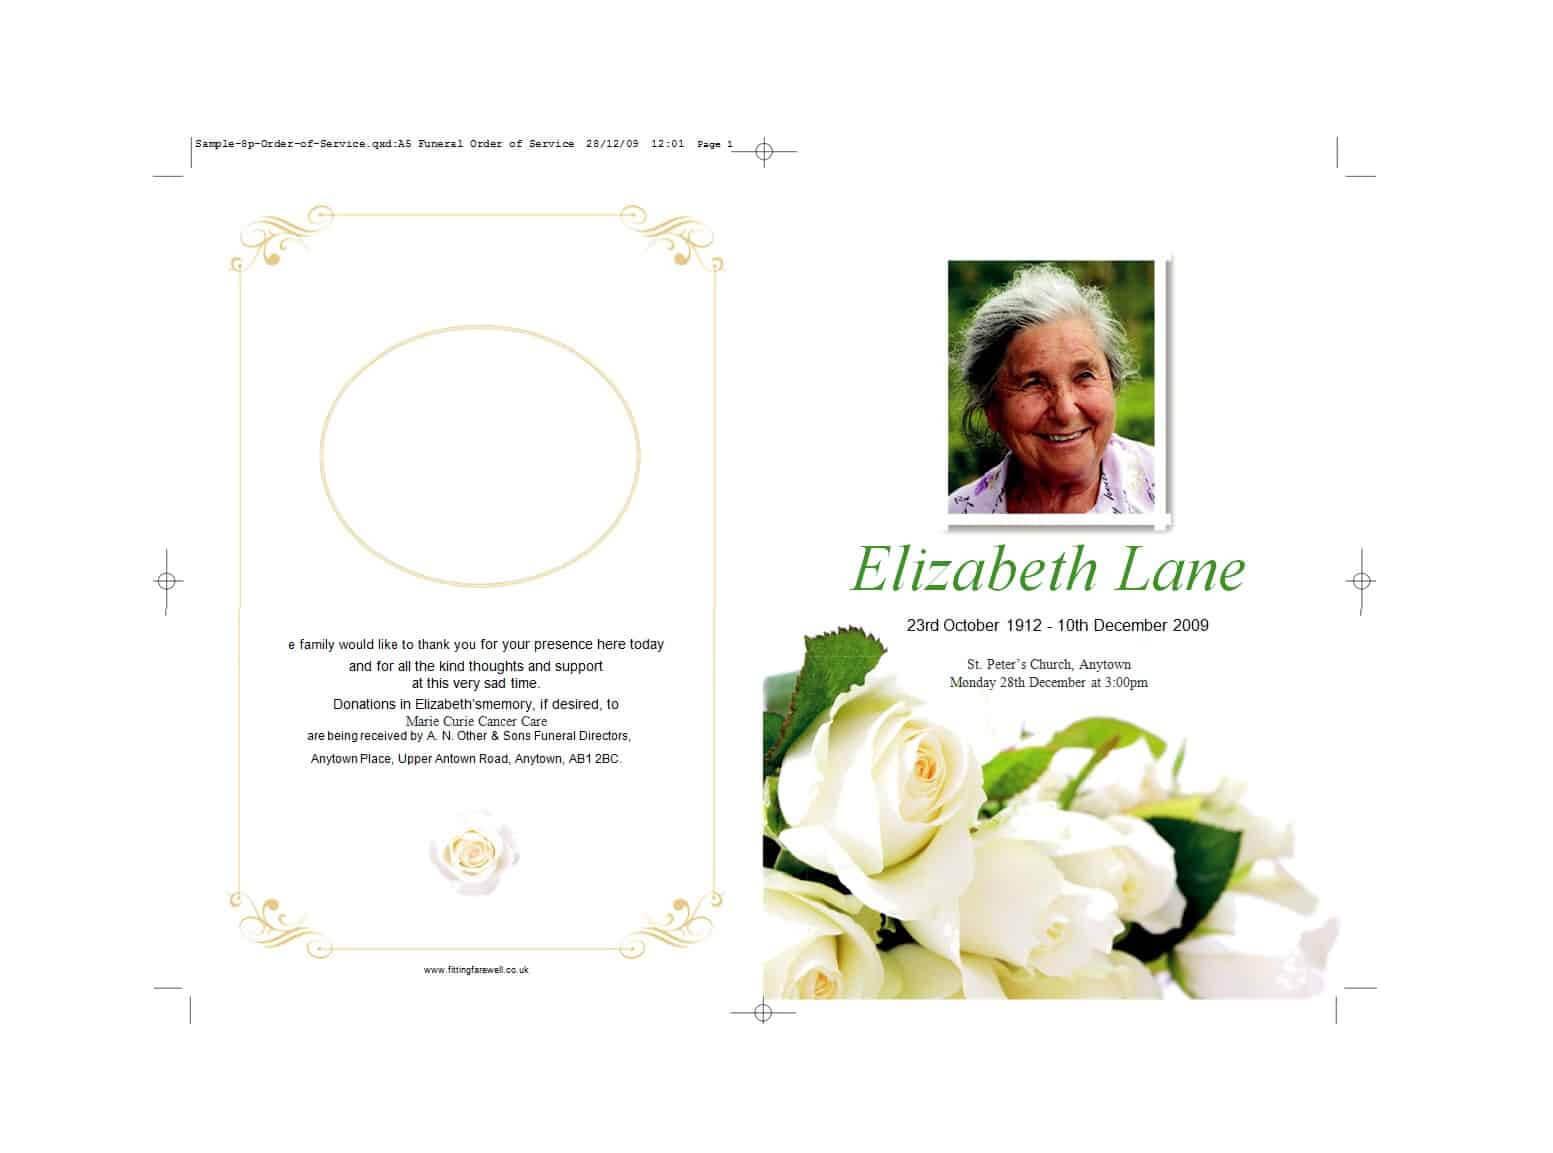 47 Free Funeral Program Templates (In Word Format) ᐅ With Regard To Memorial Brochure Template